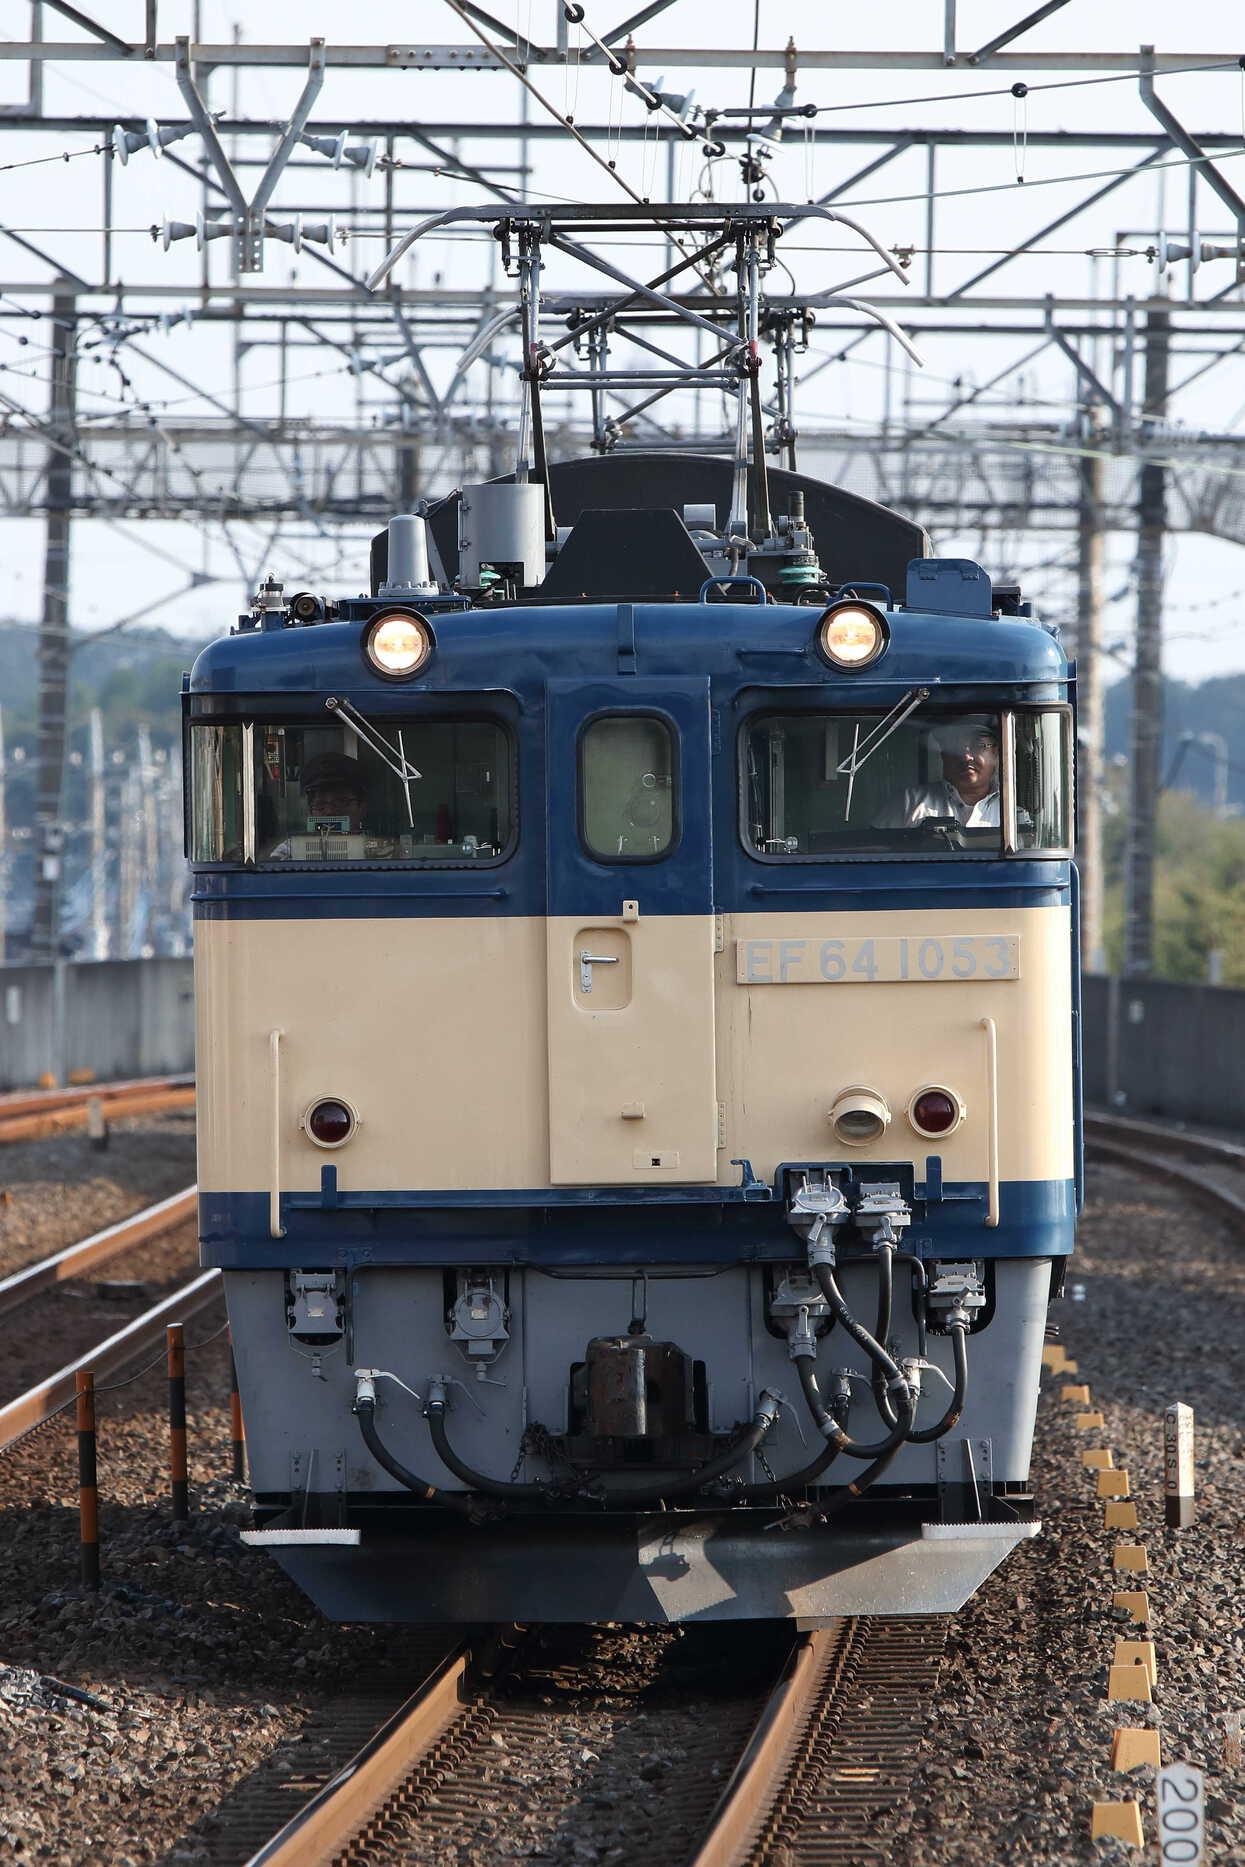 単9551列車 旧客回送牽引機黒磯送り込み EF64-1053②[高]